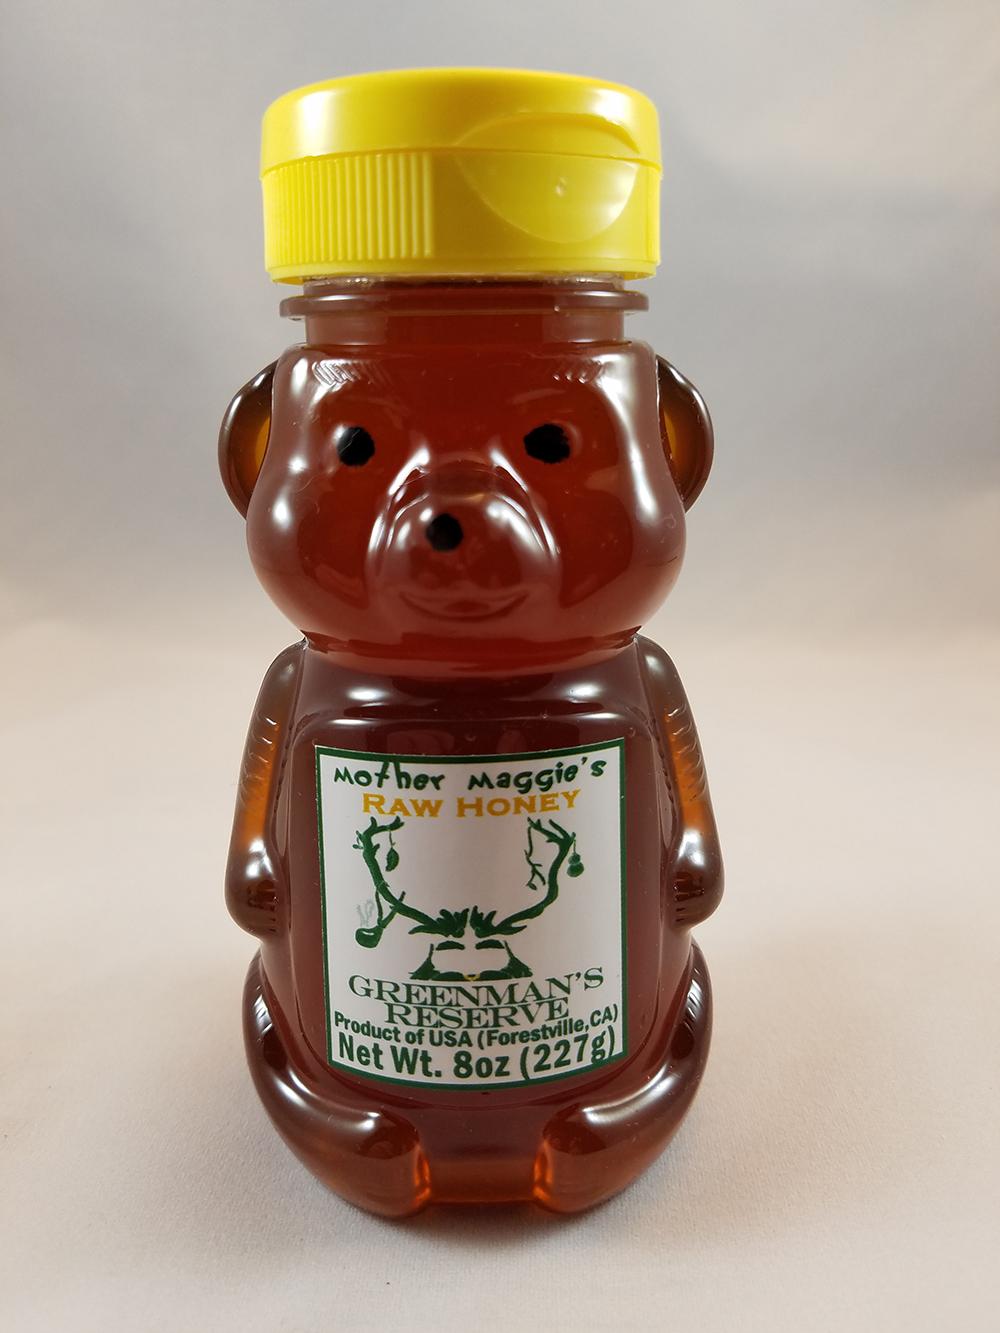 Mother Maggie's Wildflower Honey